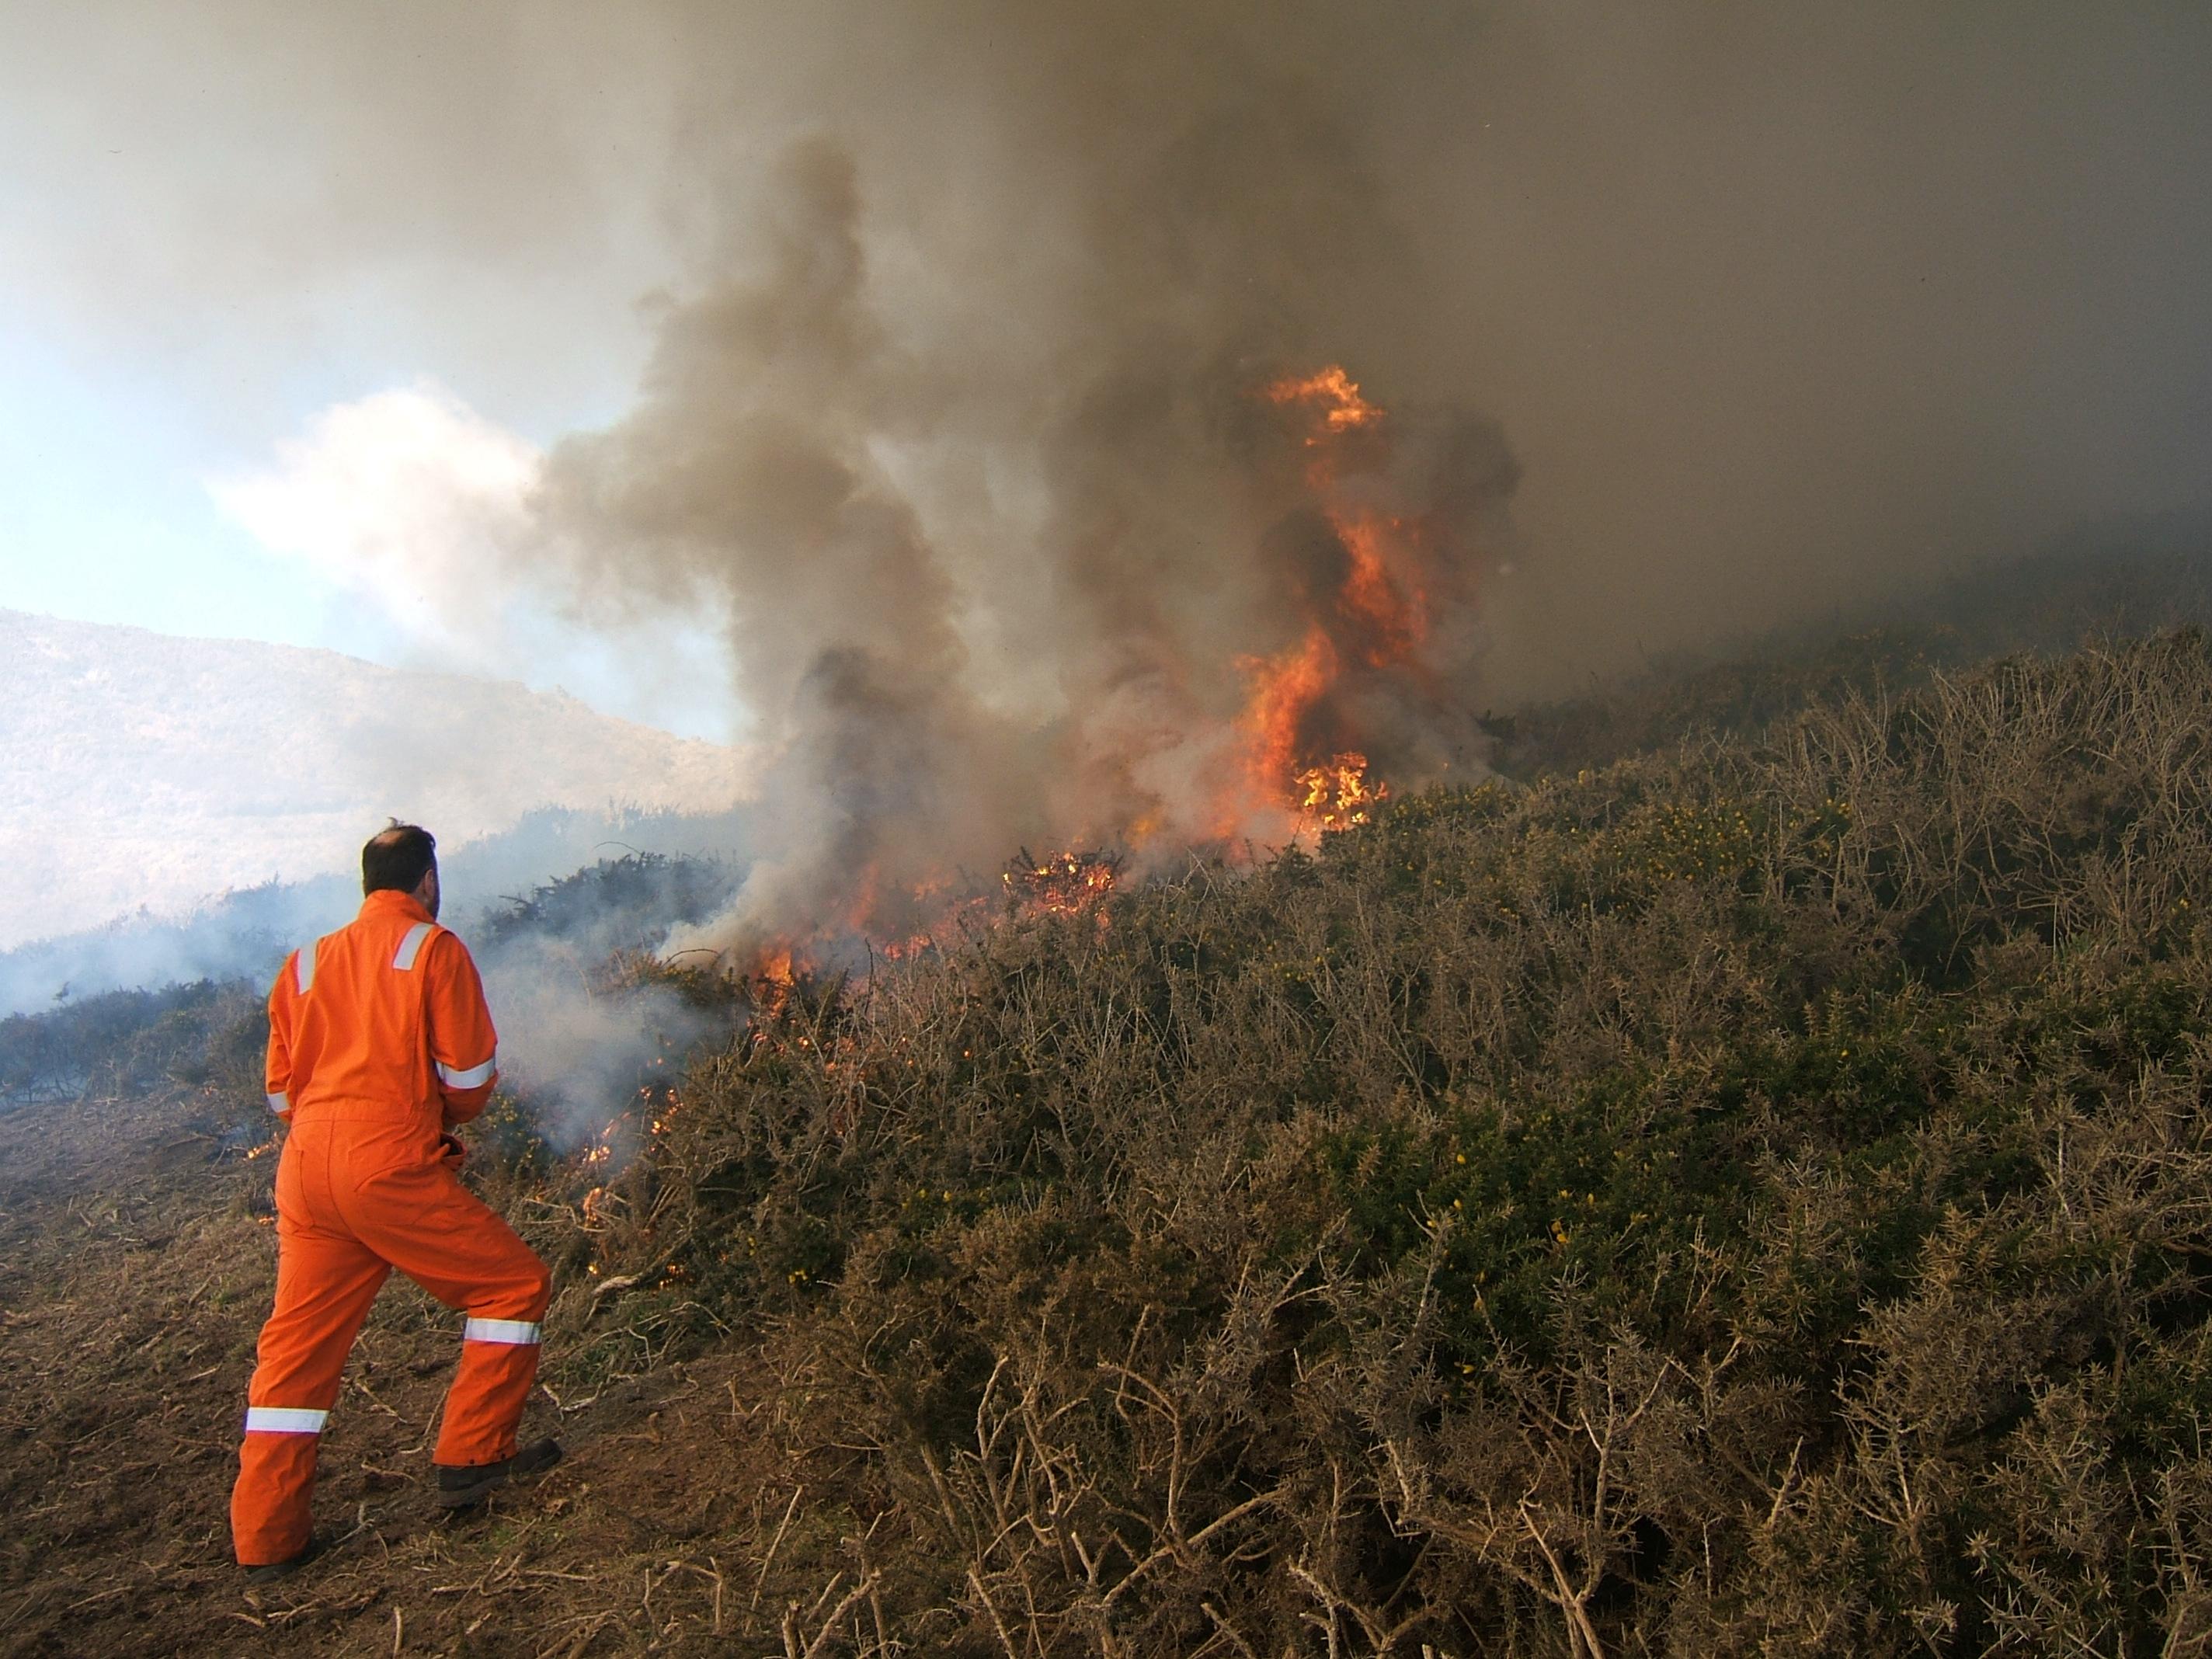 Controlled burn at Tresinwen, Pembrokeshire, Wales, UK